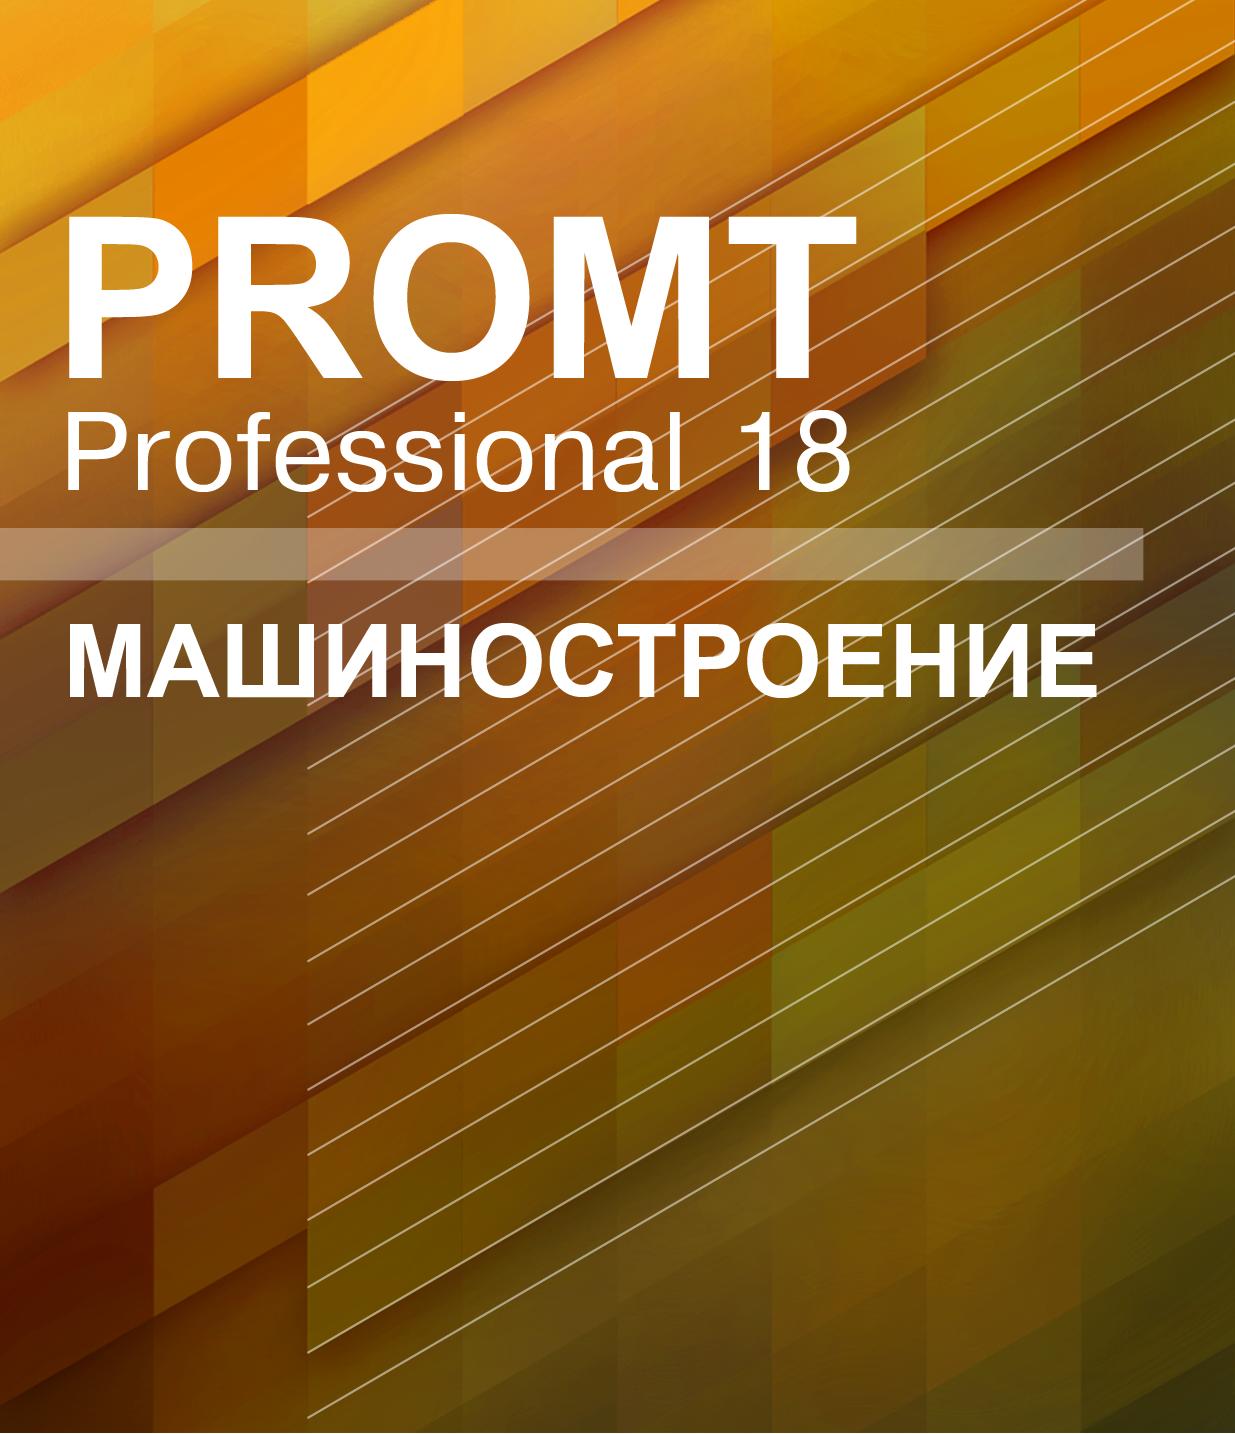 PROMT Professional 18 Машиностроение